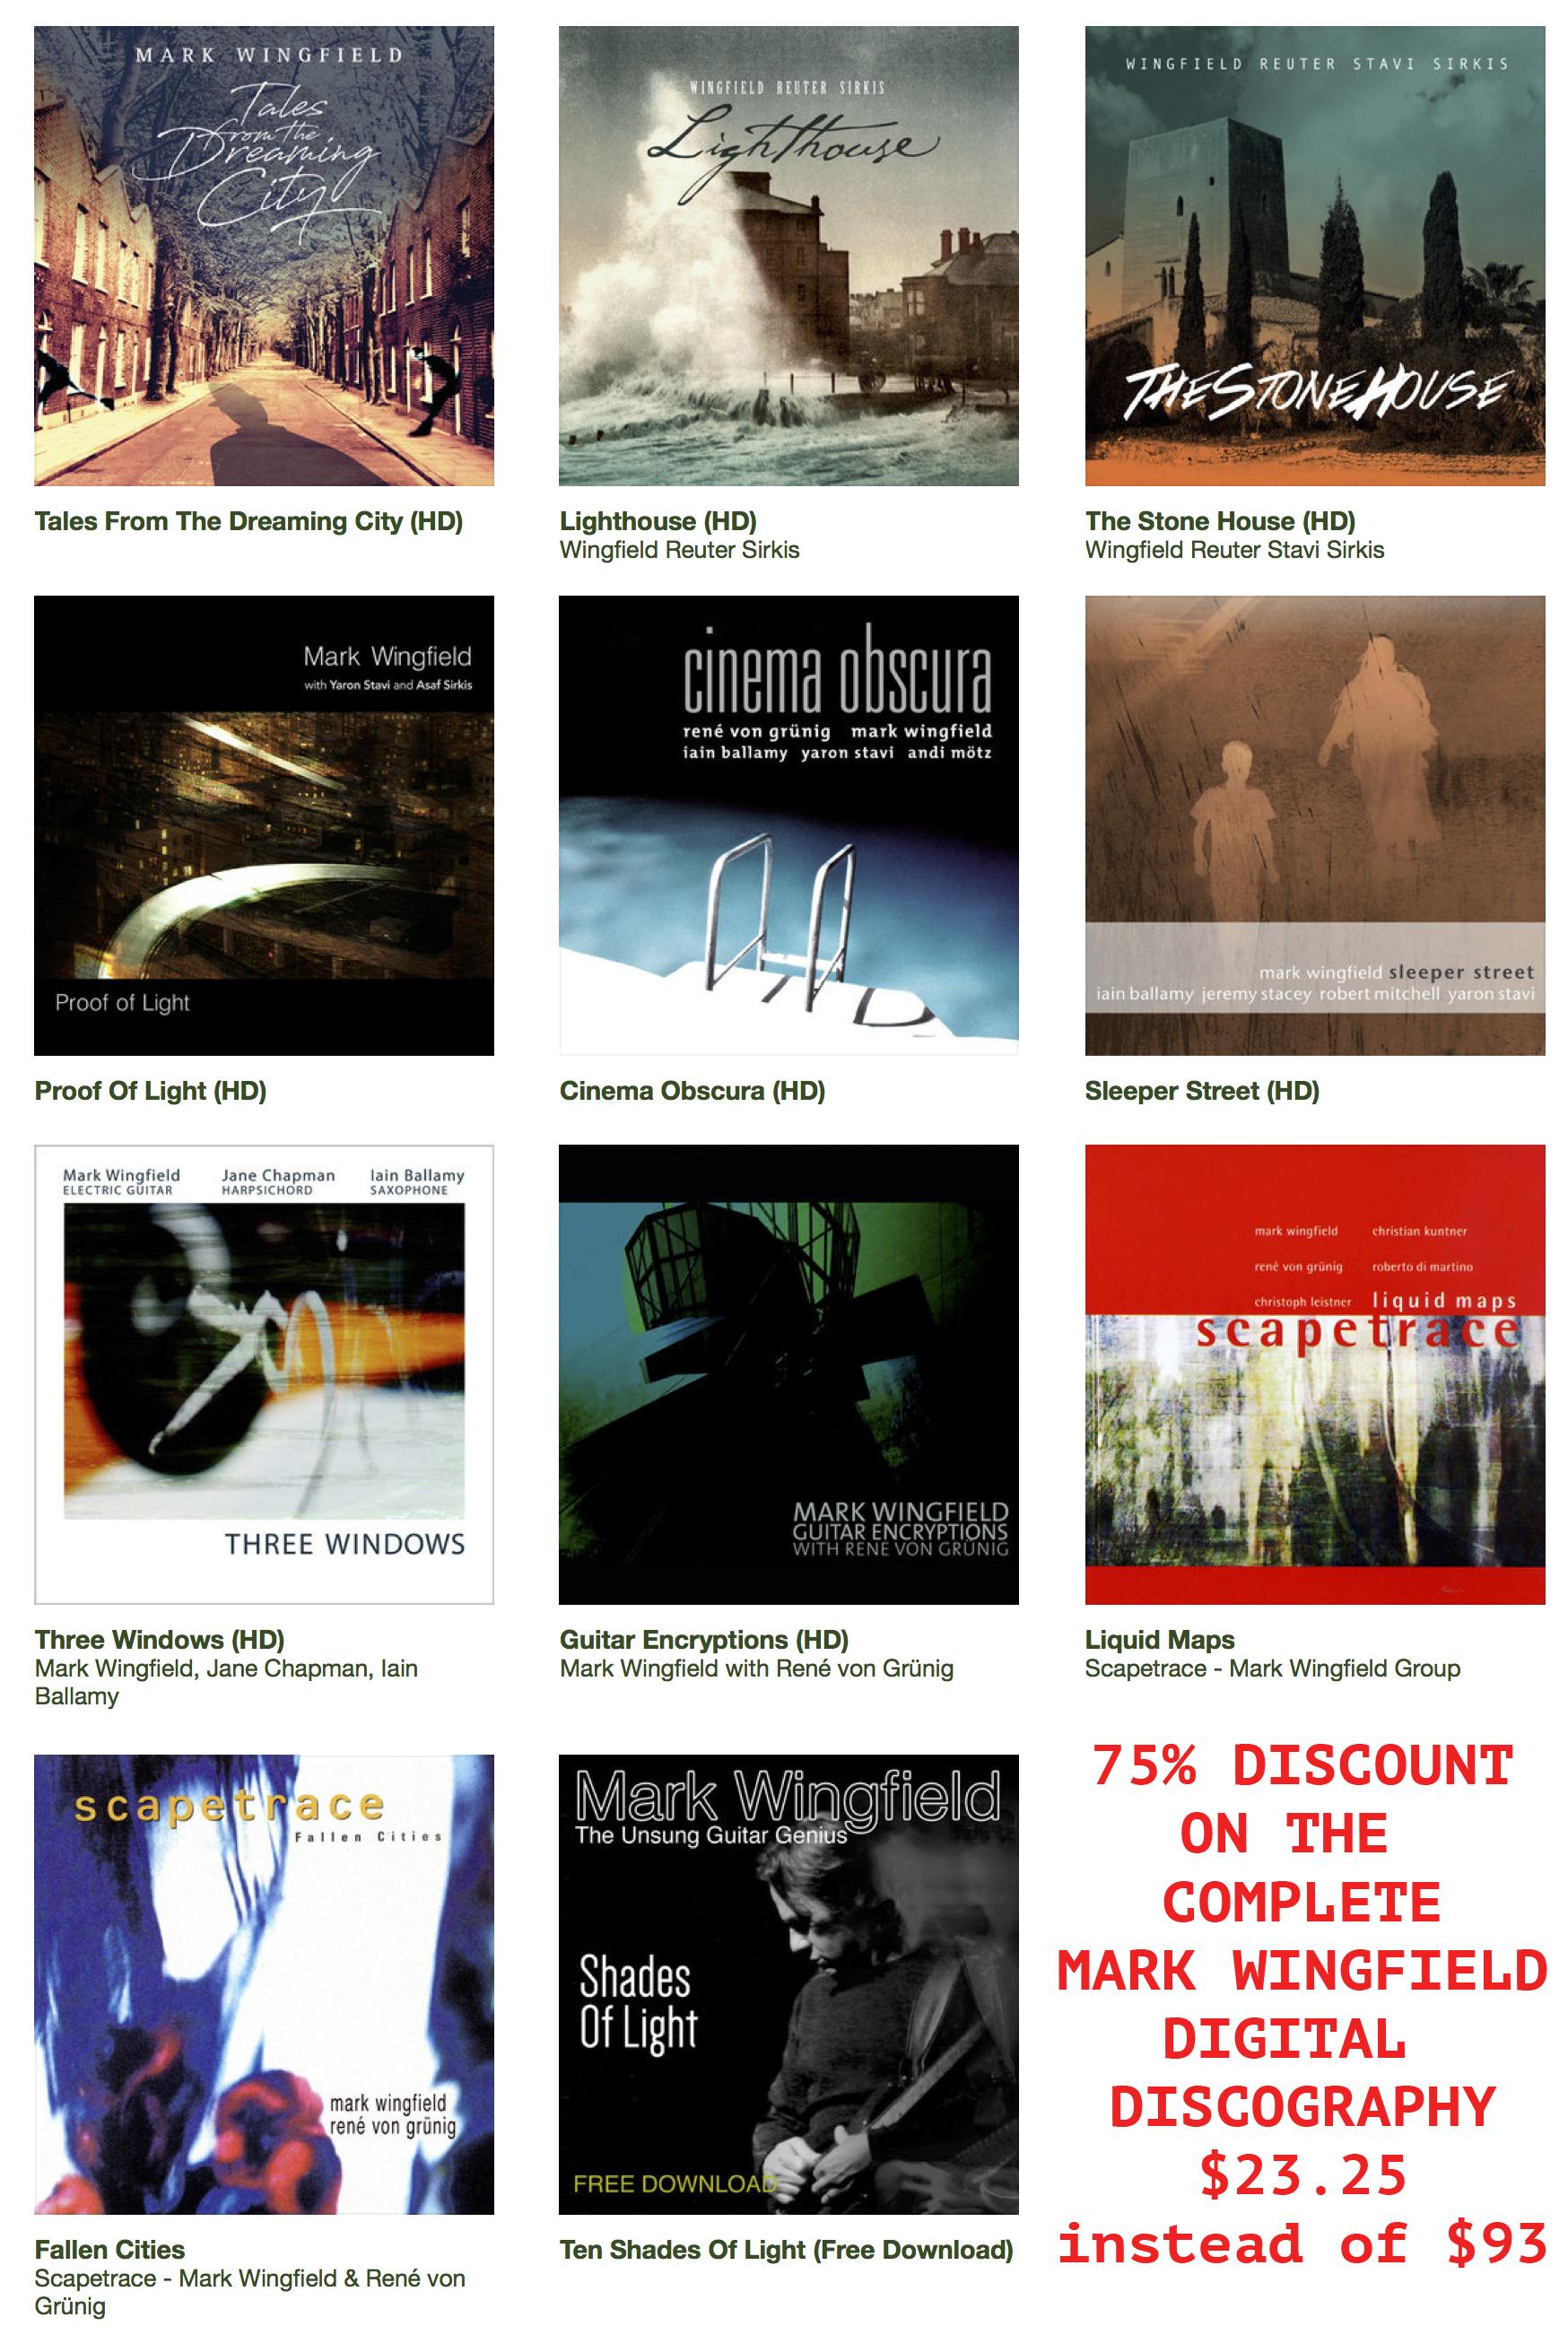 Innovative British Guitar Poet MARK WINGFIELD Releases